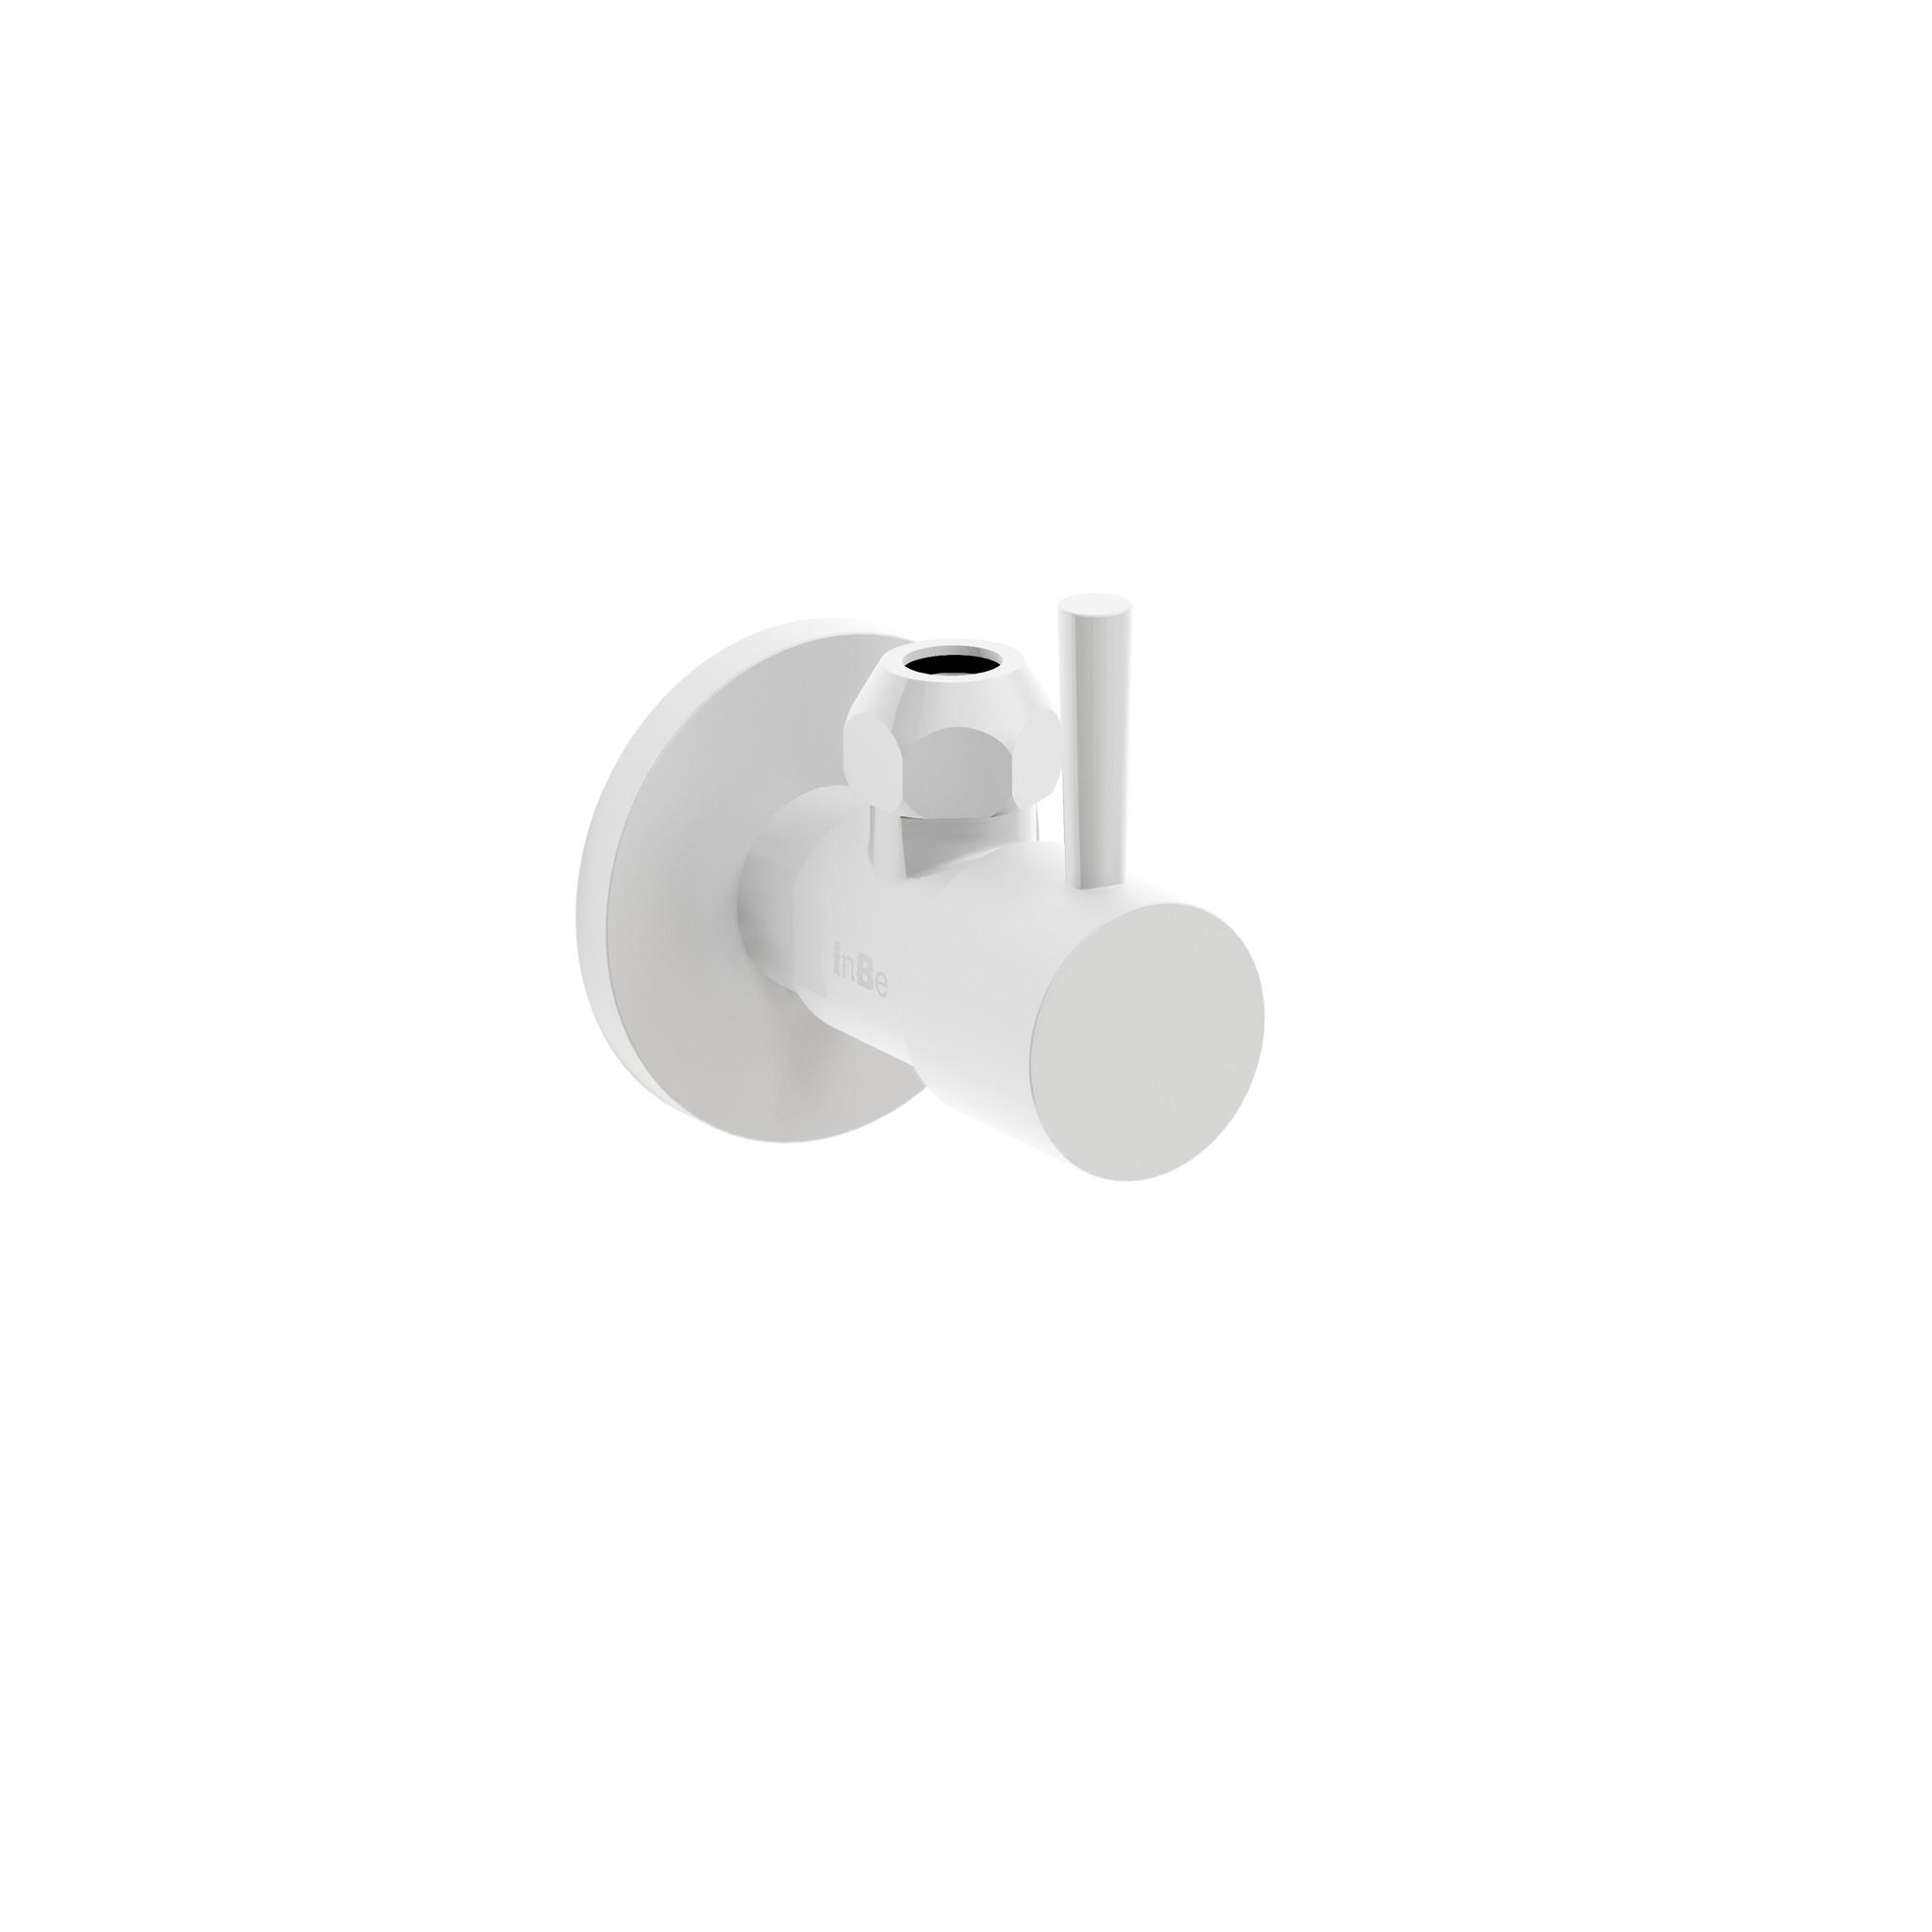 InBe angle valve